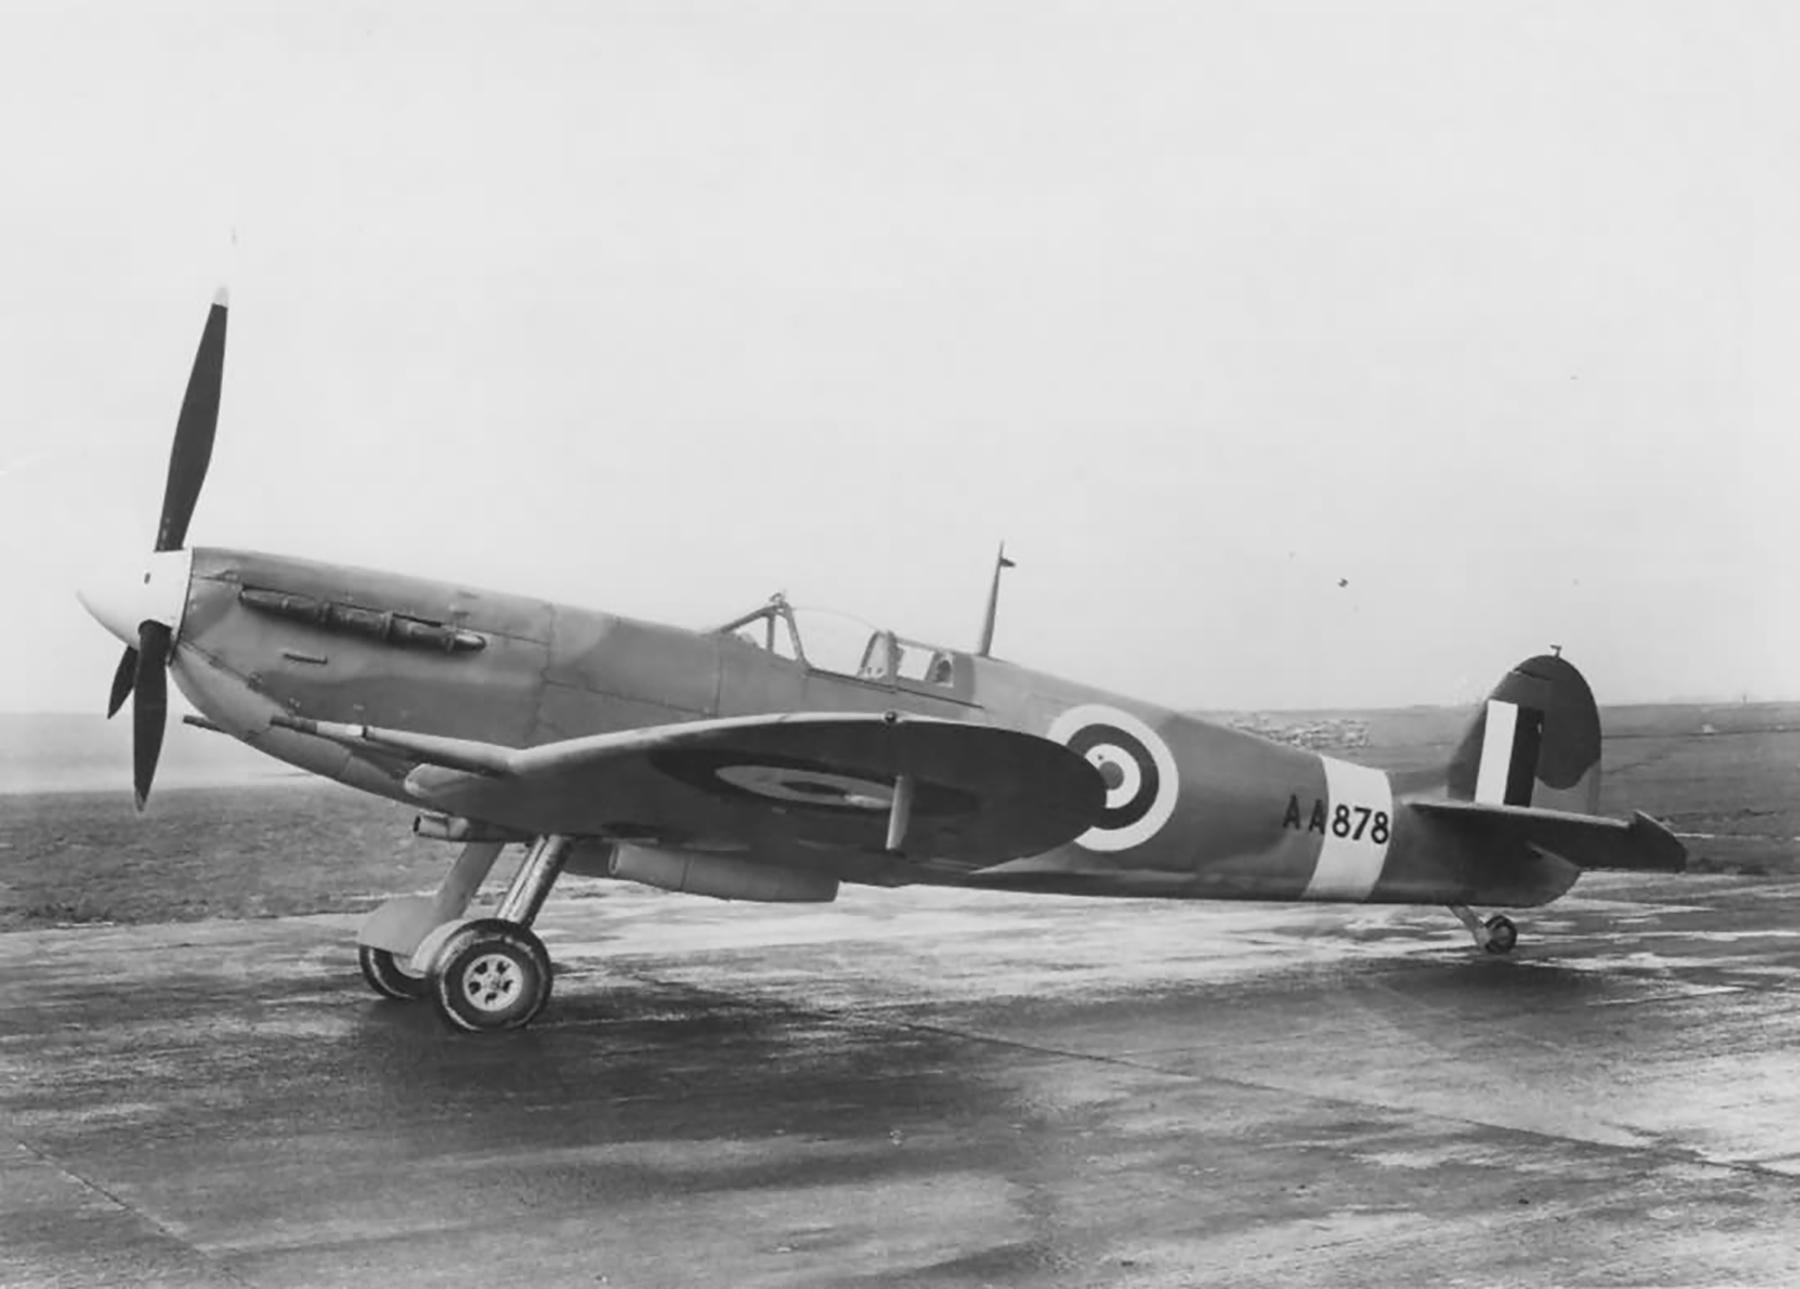 Factory fresh Spitfire Vc RAF AA878 England web 01